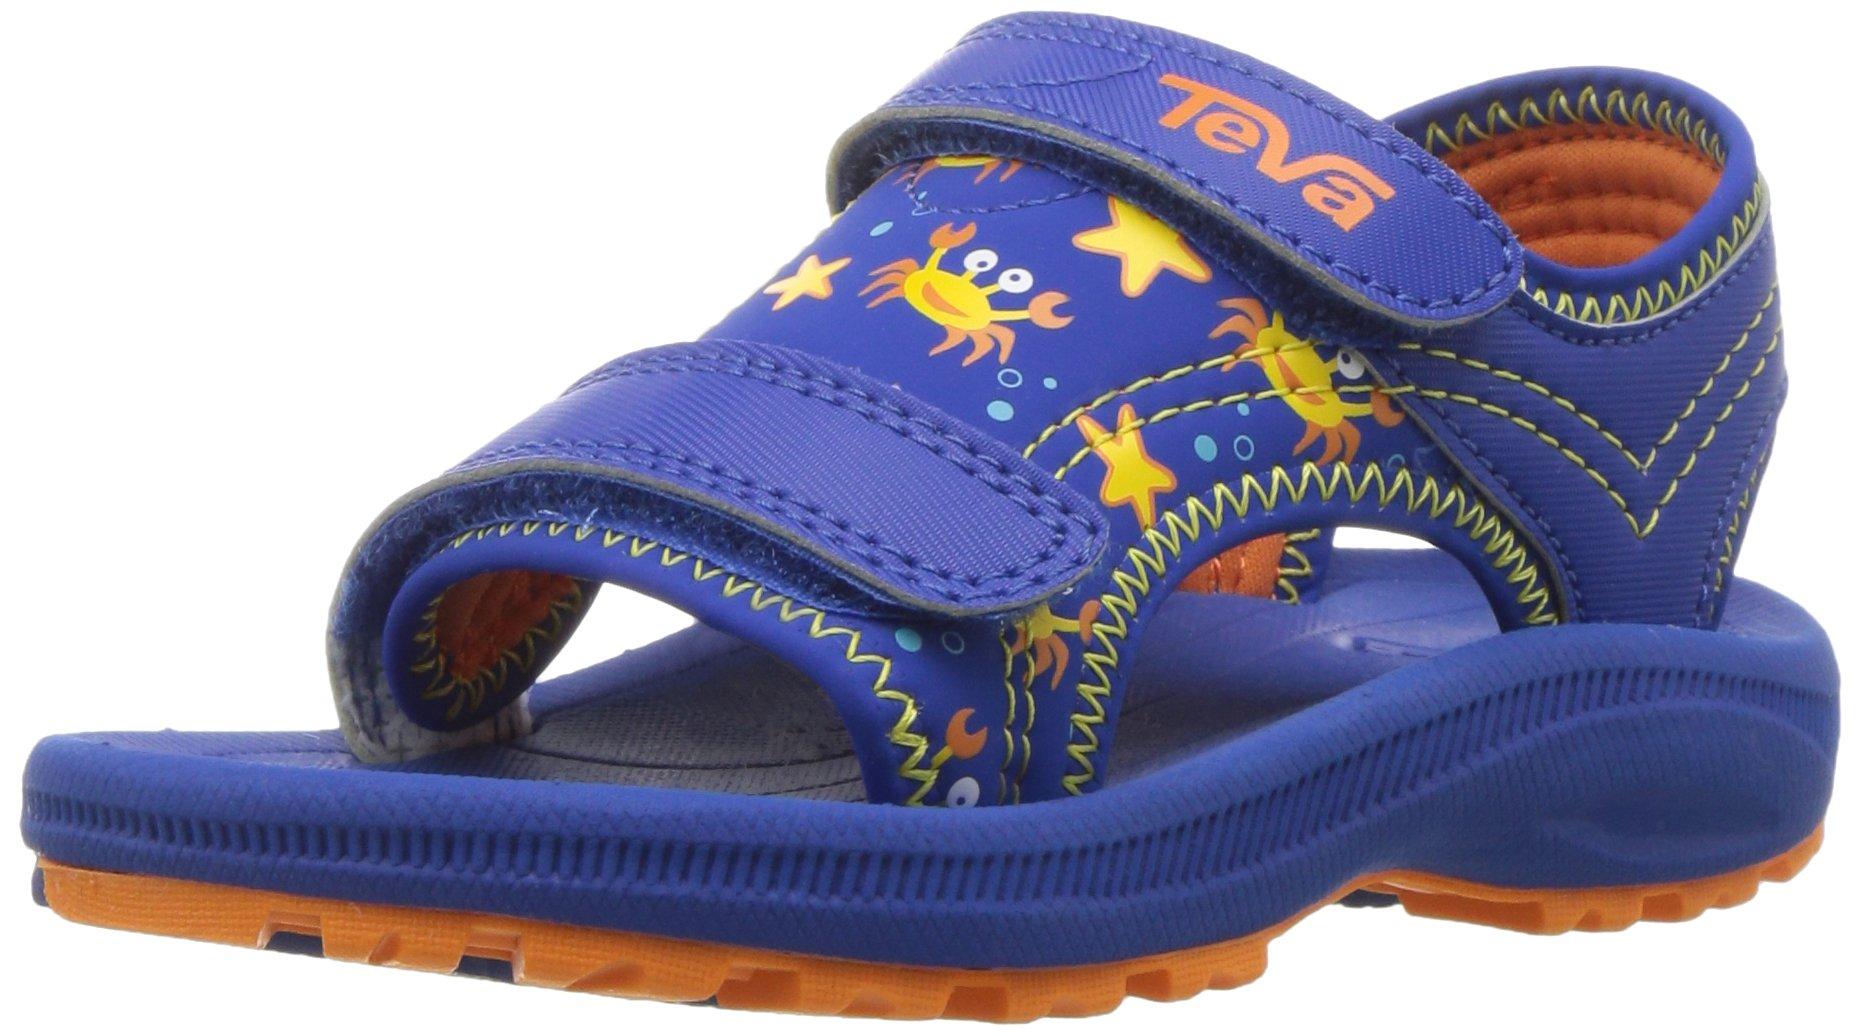 Teva Boys' Psyclone 4 Sandal Crazy Crabs Blue/Orange 4 M US Toddler